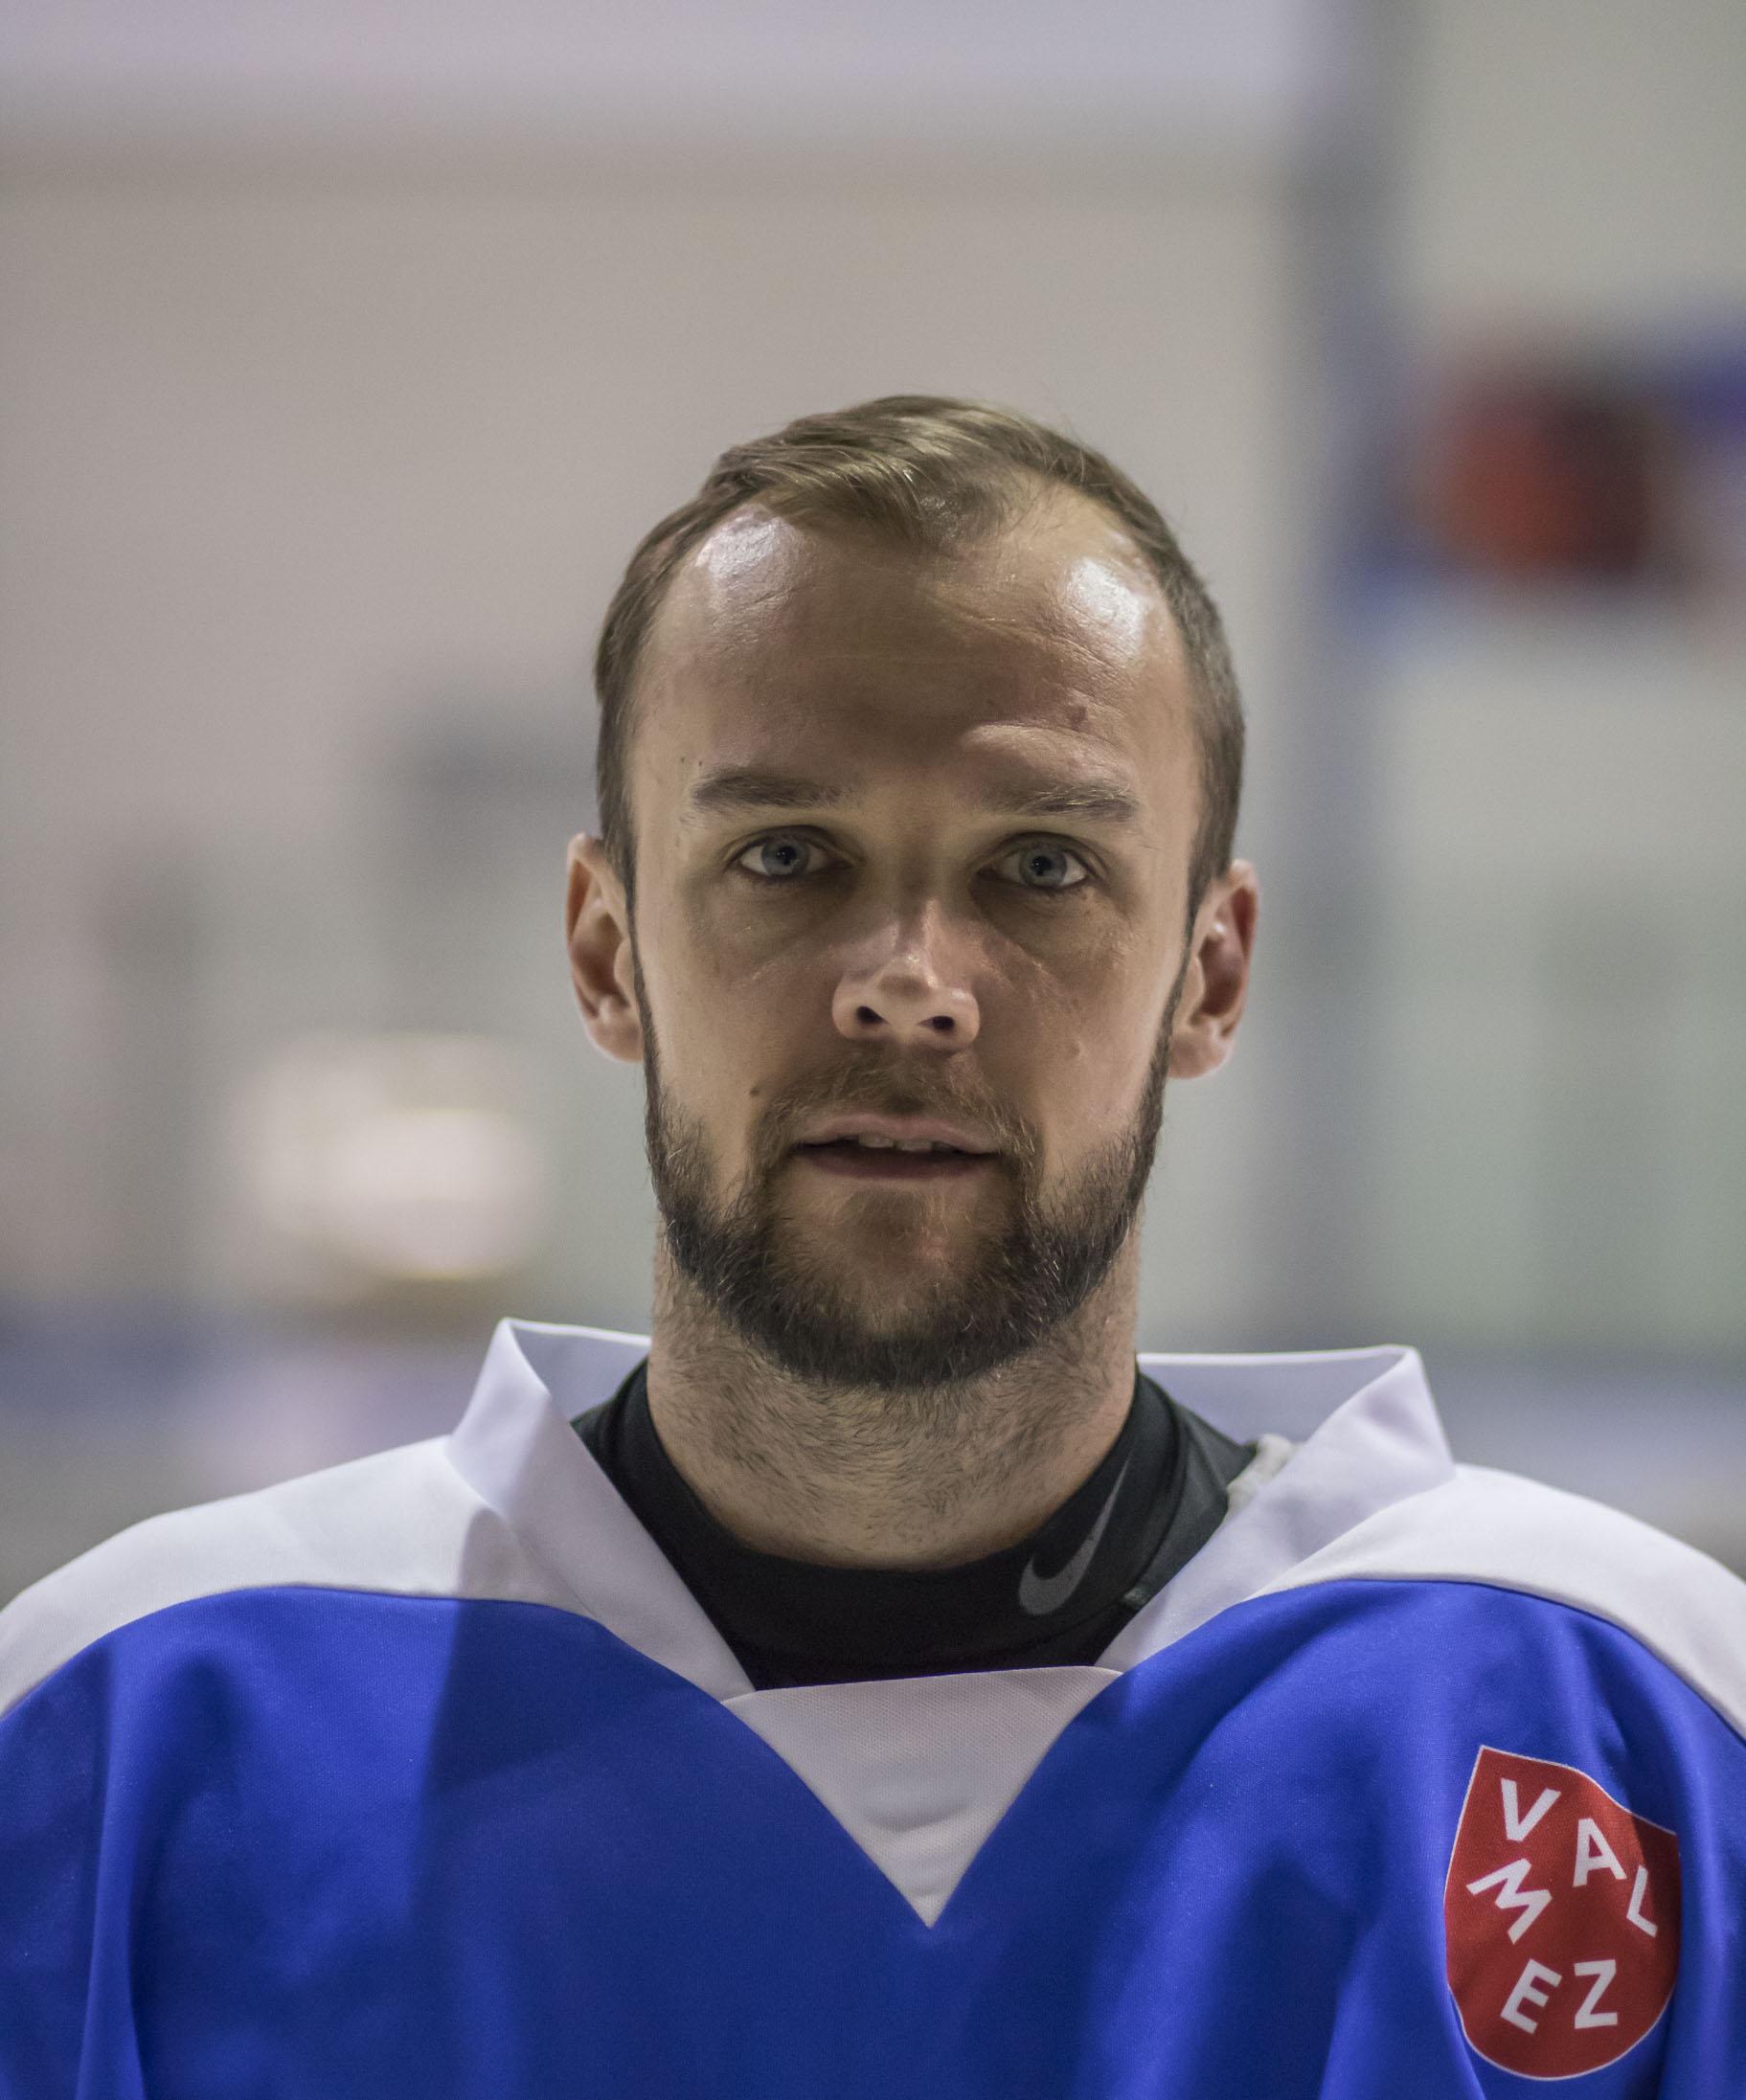 Petr Dvoøák #83